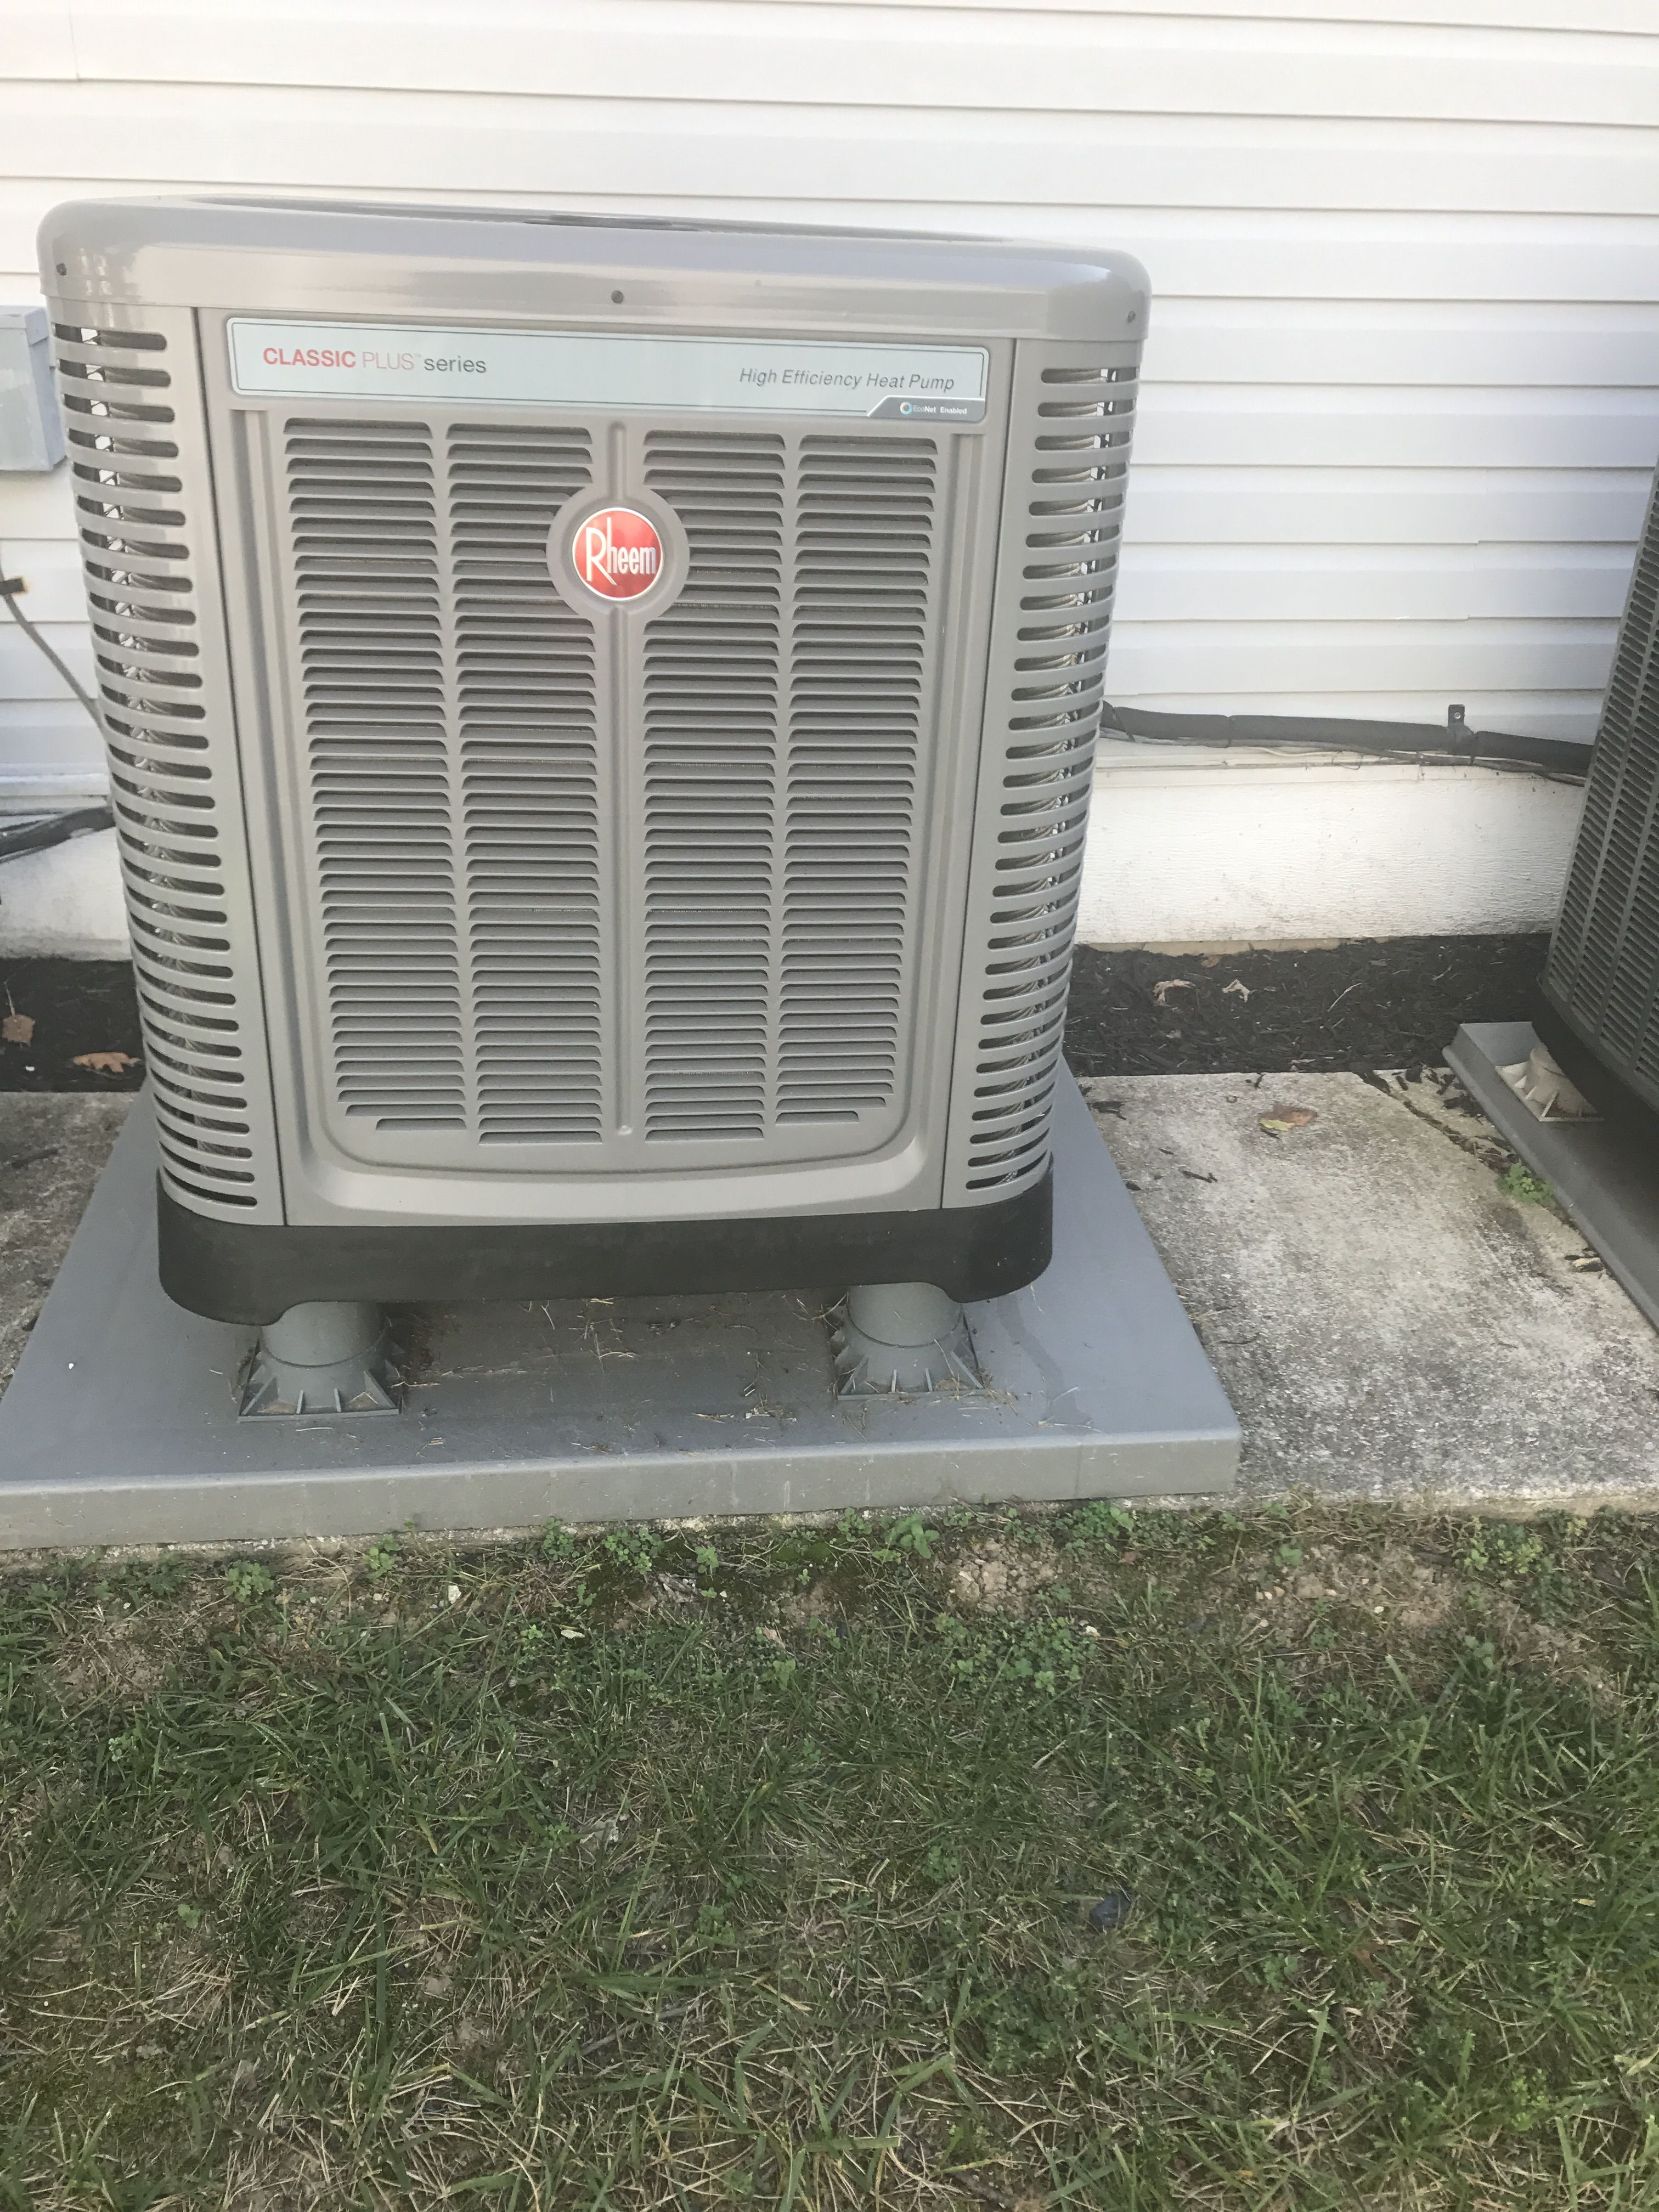 Outdoor Rheem Heat Pump System Heat pump system, Heat